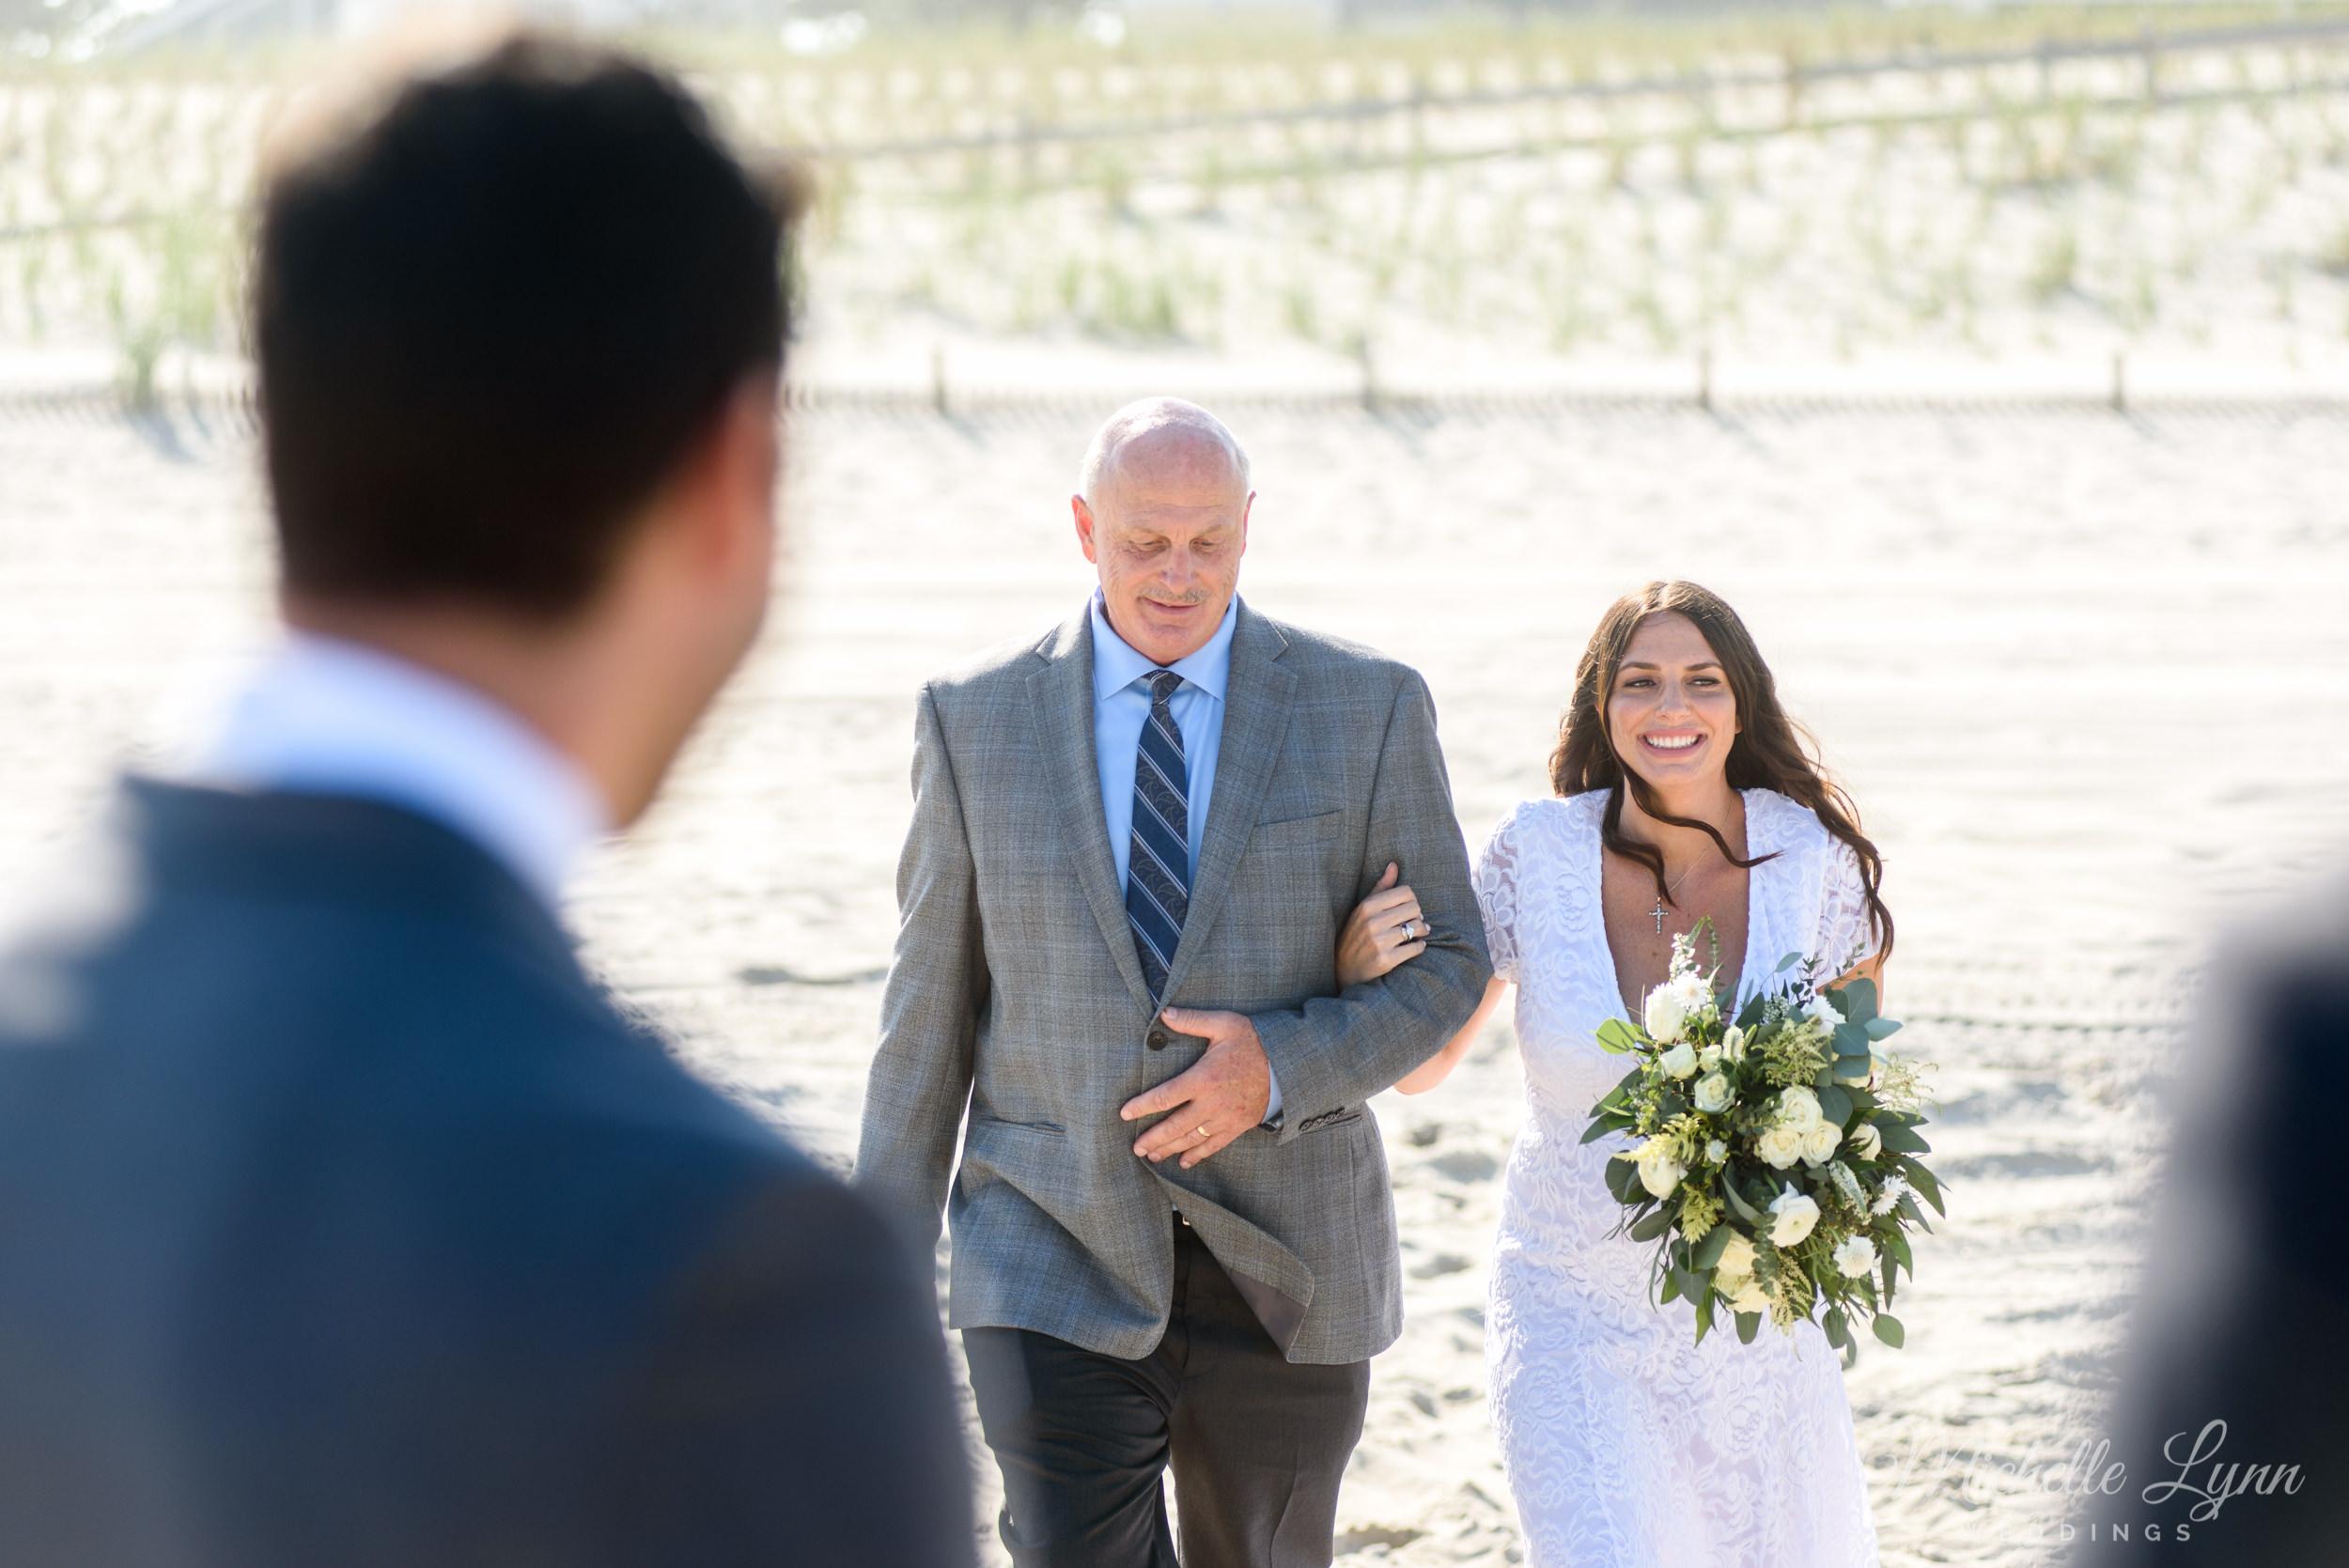 mlw-brant-beach-lbi-wedding-photography-14.jpg